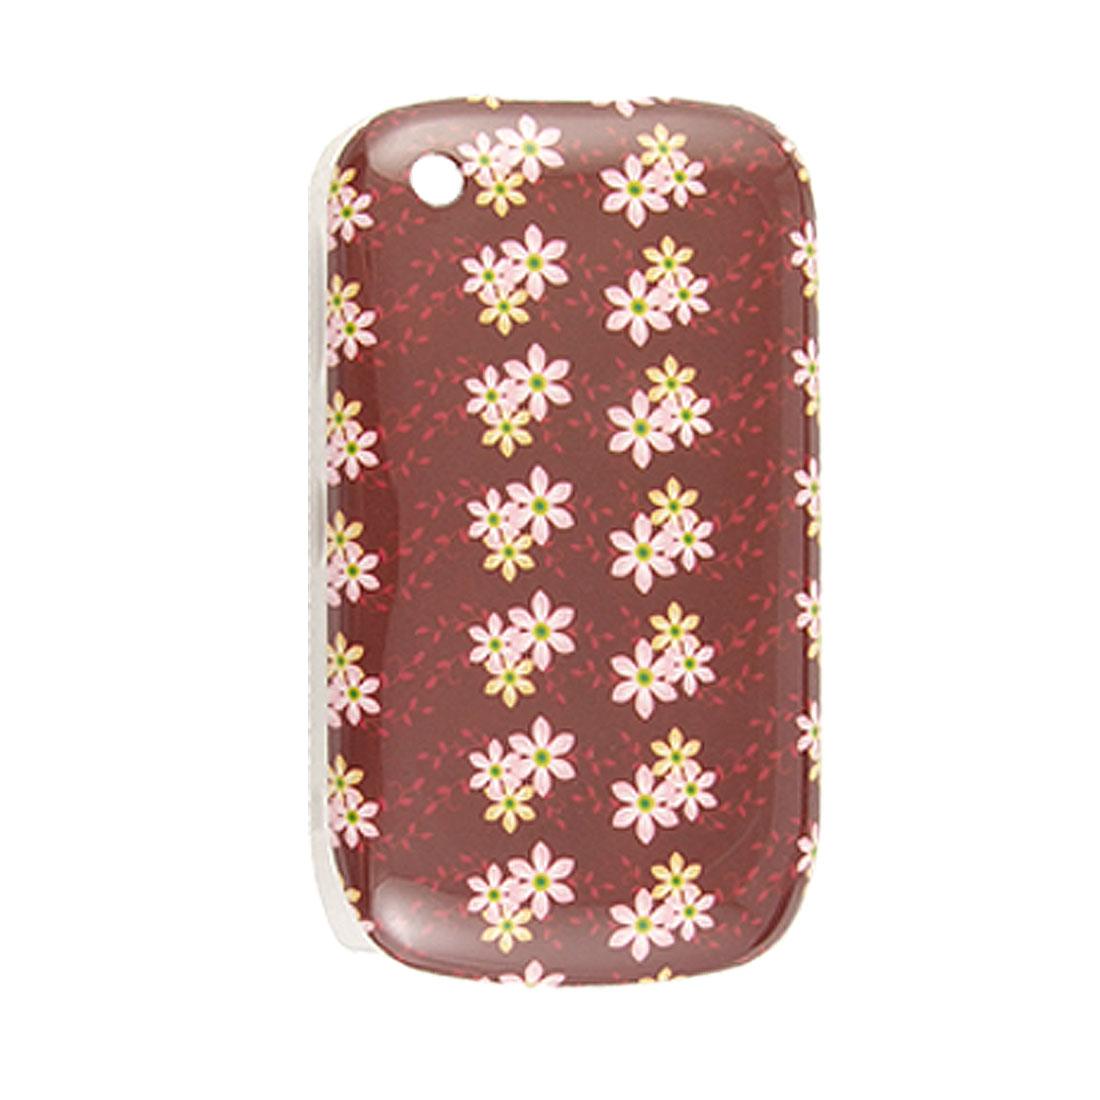 IMD Floral Burgundy Hard Plastic Back Case for Blackberry 8520